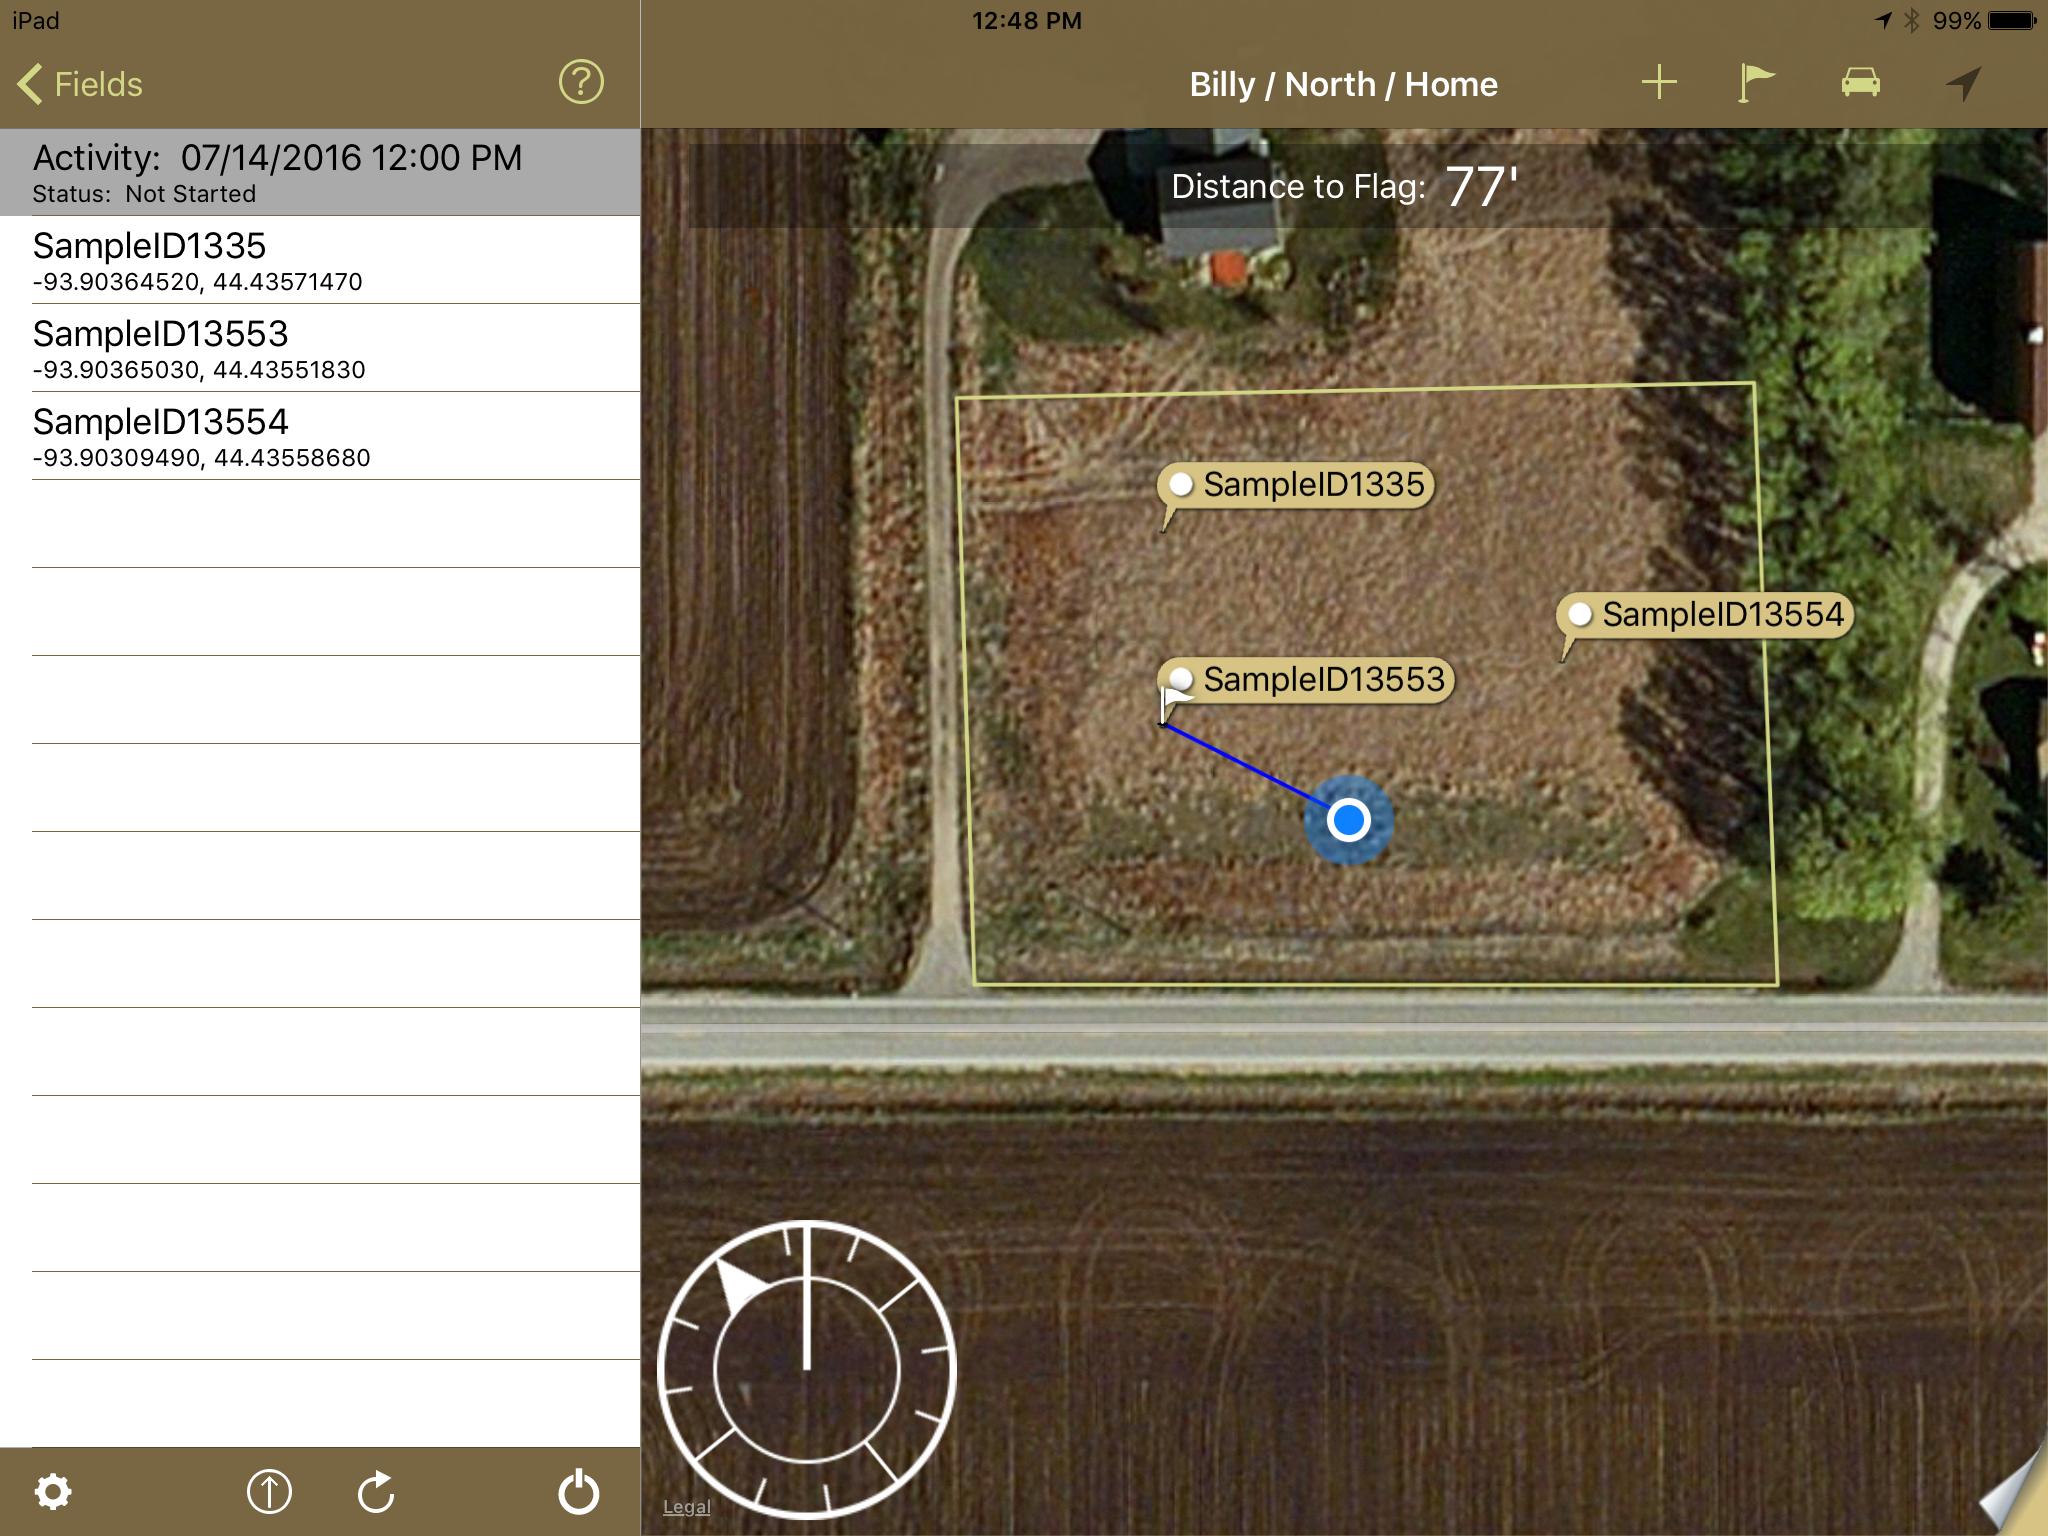 Sampling app navigation dial on iPad